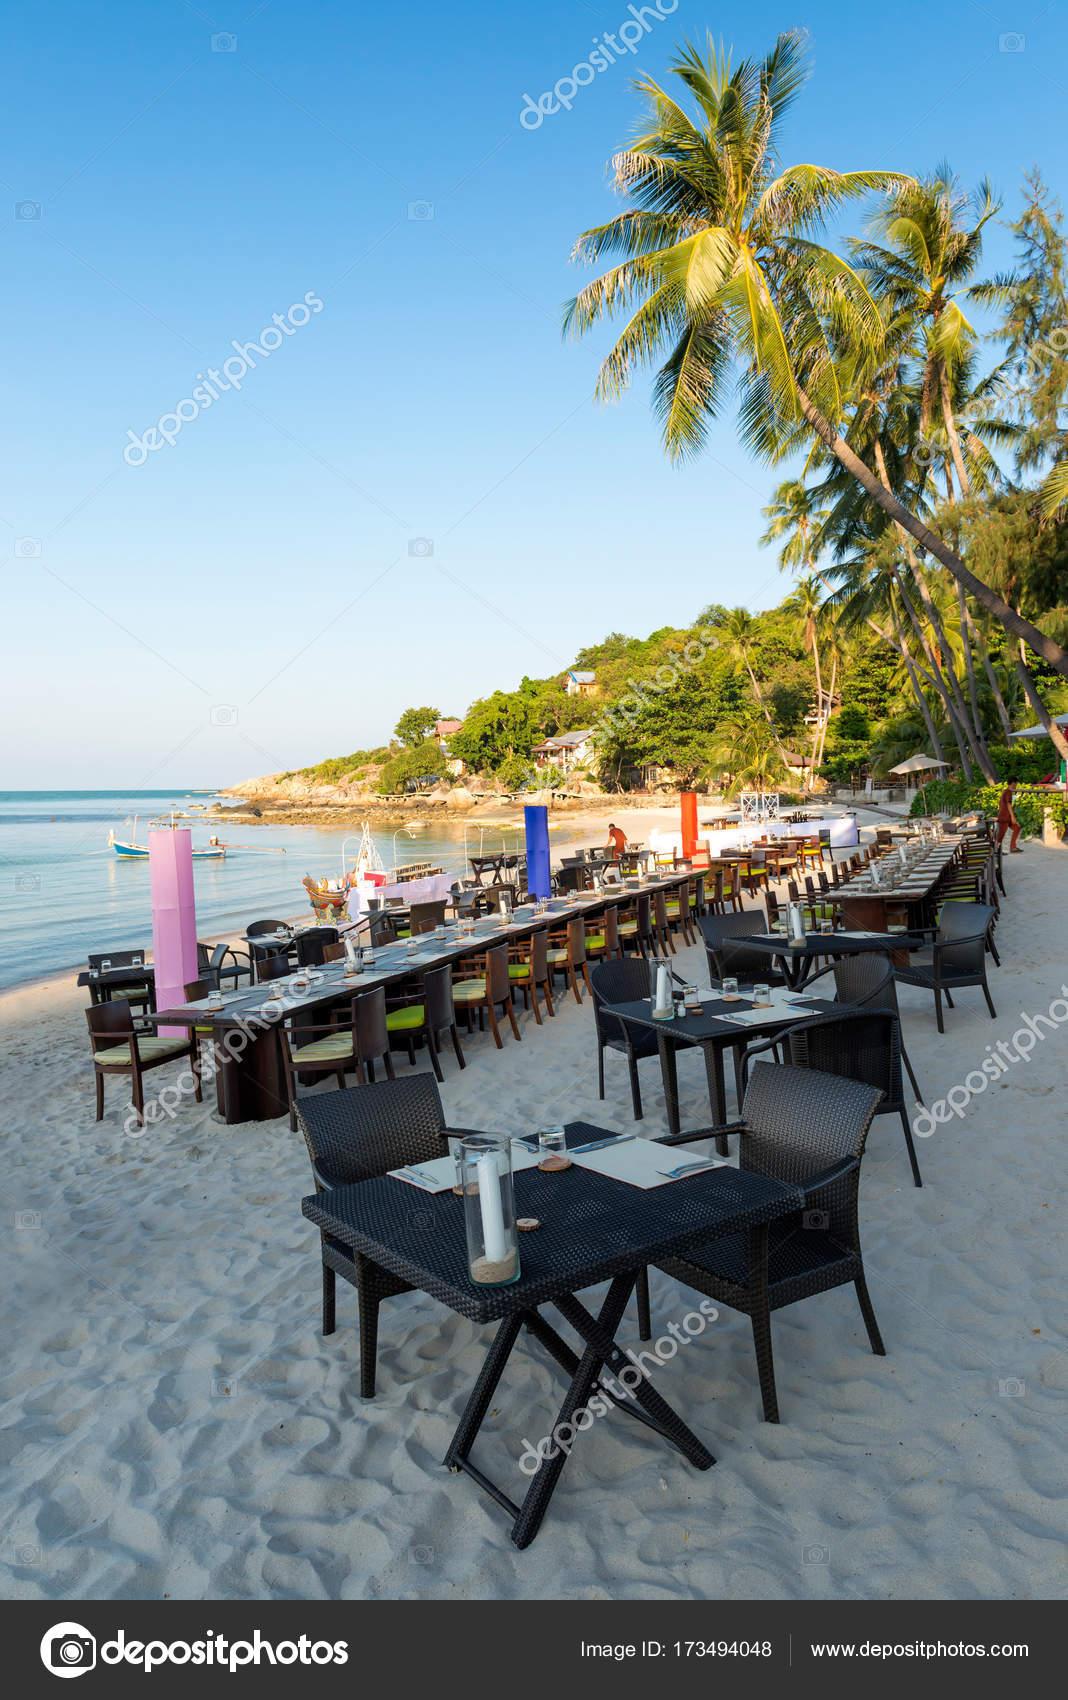 Beach Restaurant At The Koh Samui Island In Thailand Stock